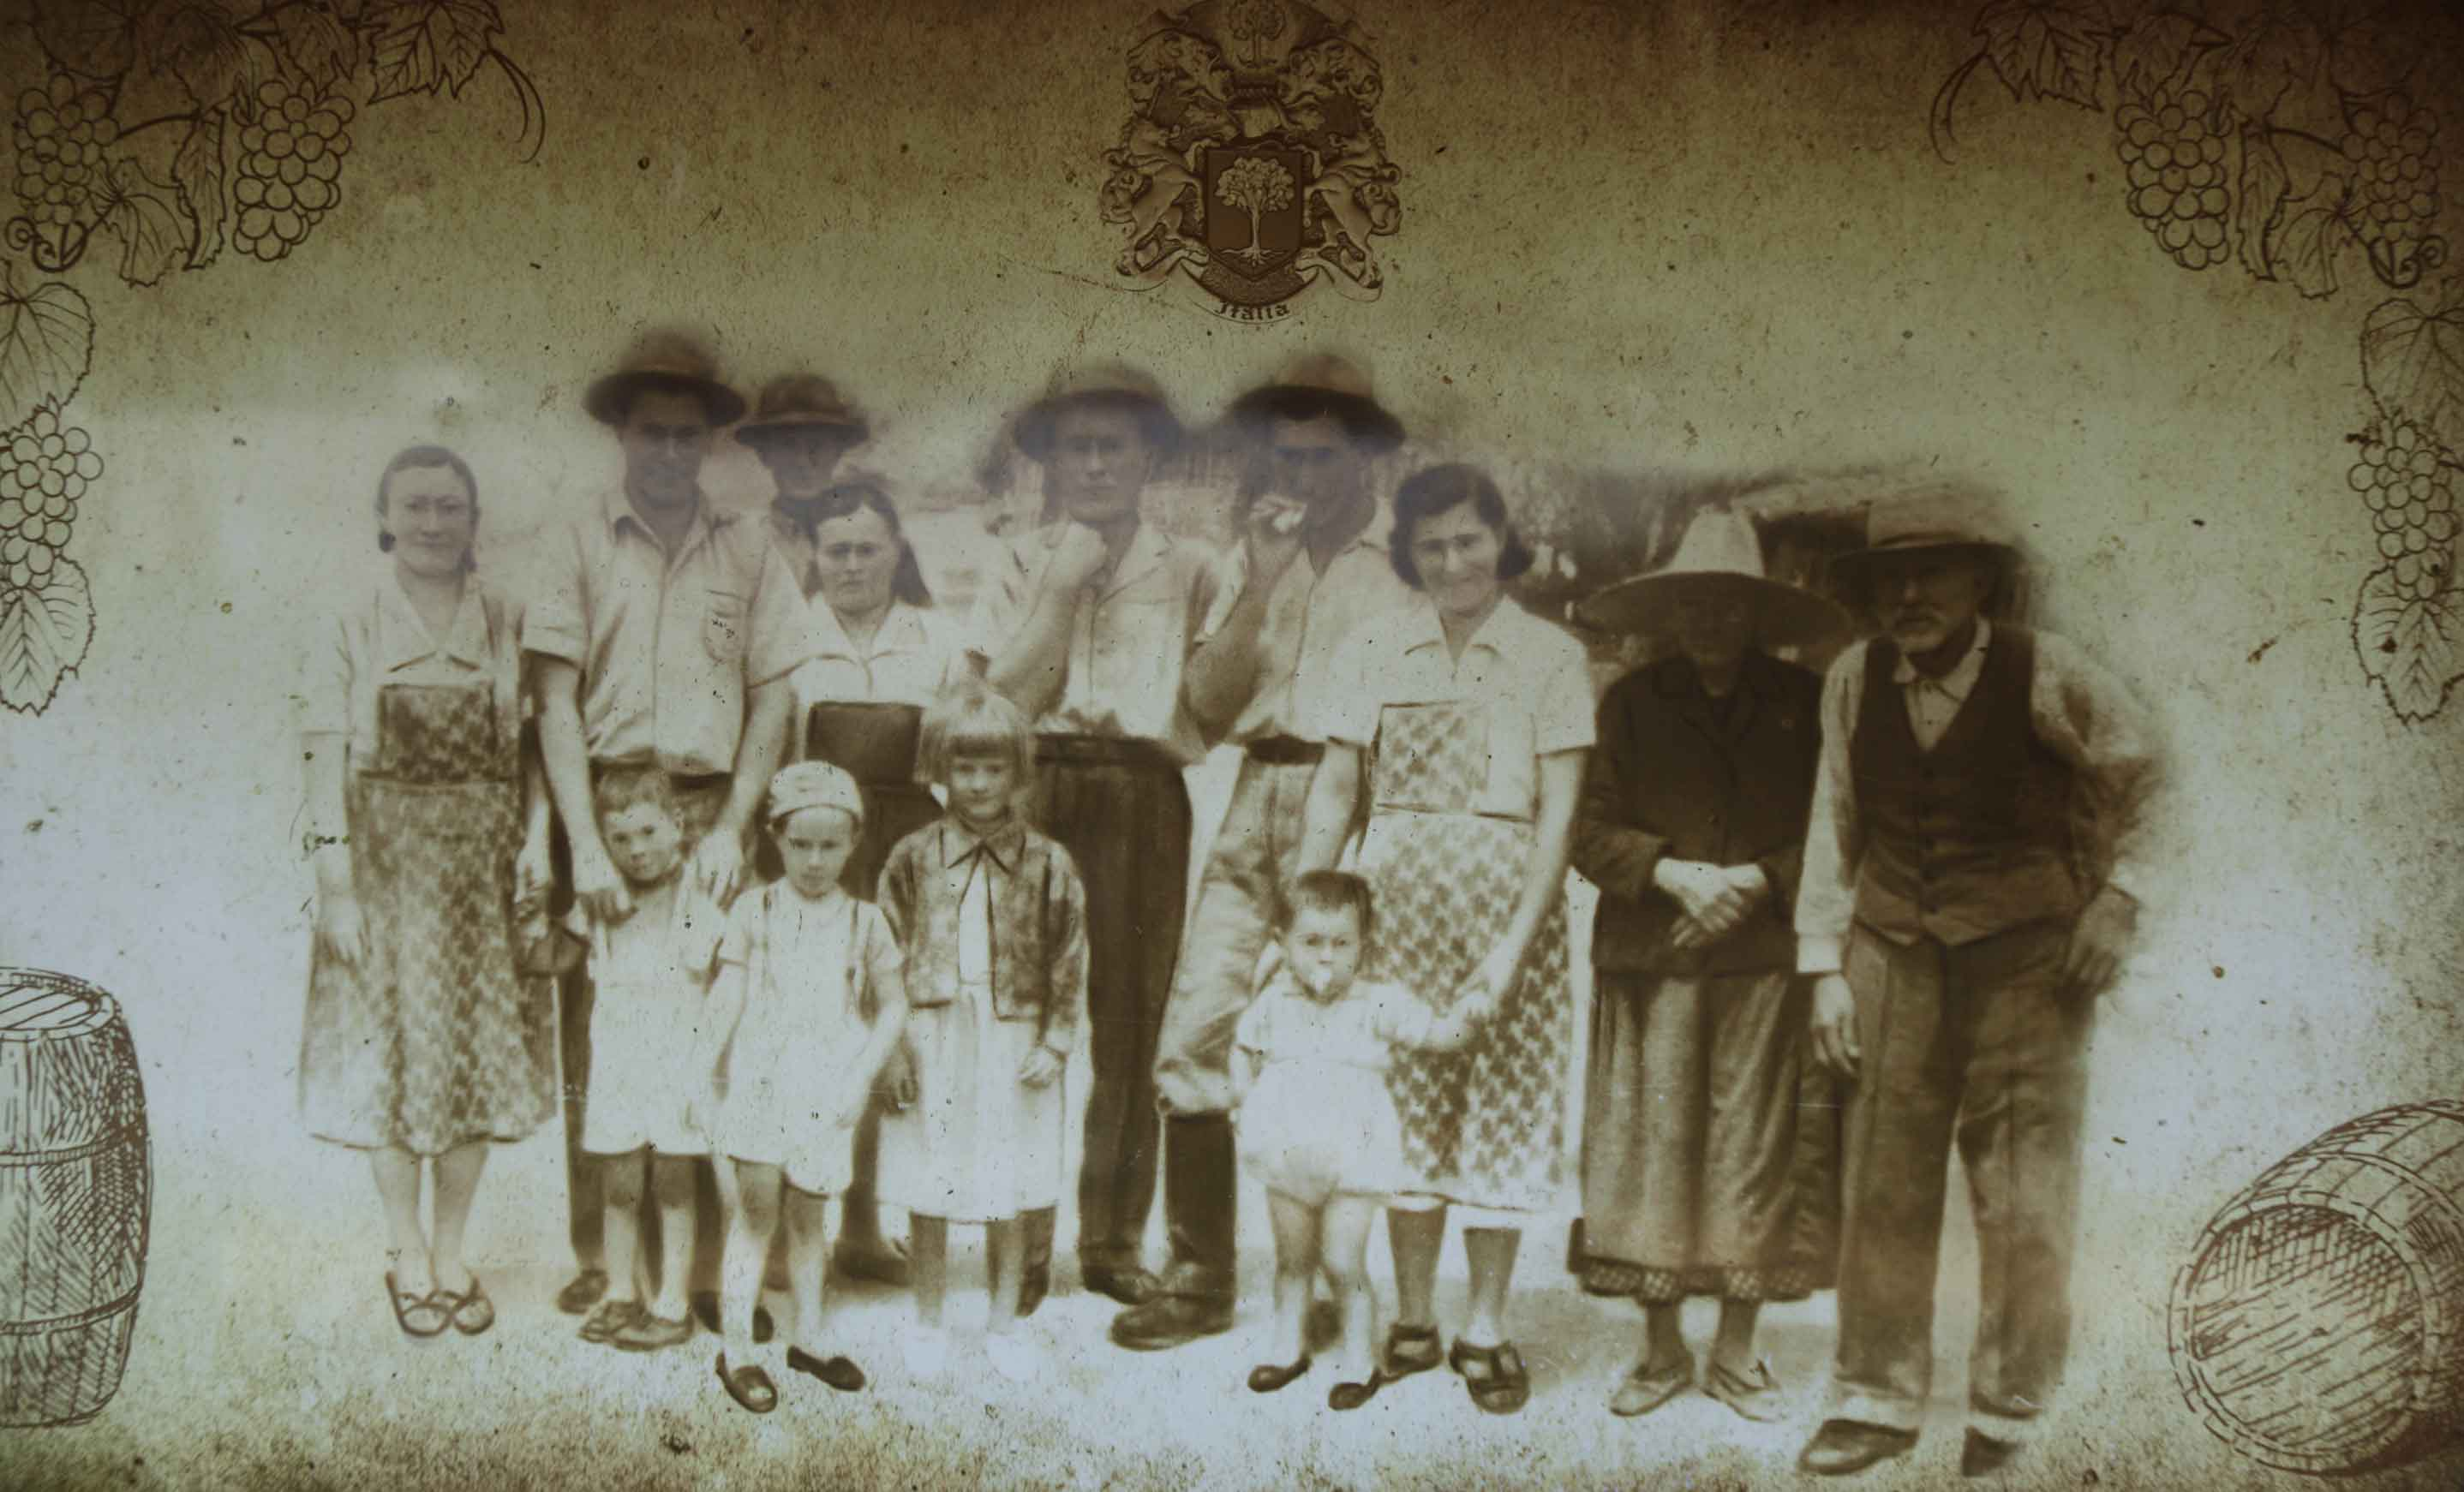 jundiai-historia-imigracao-familia-brunholi-_MG_1979-bx